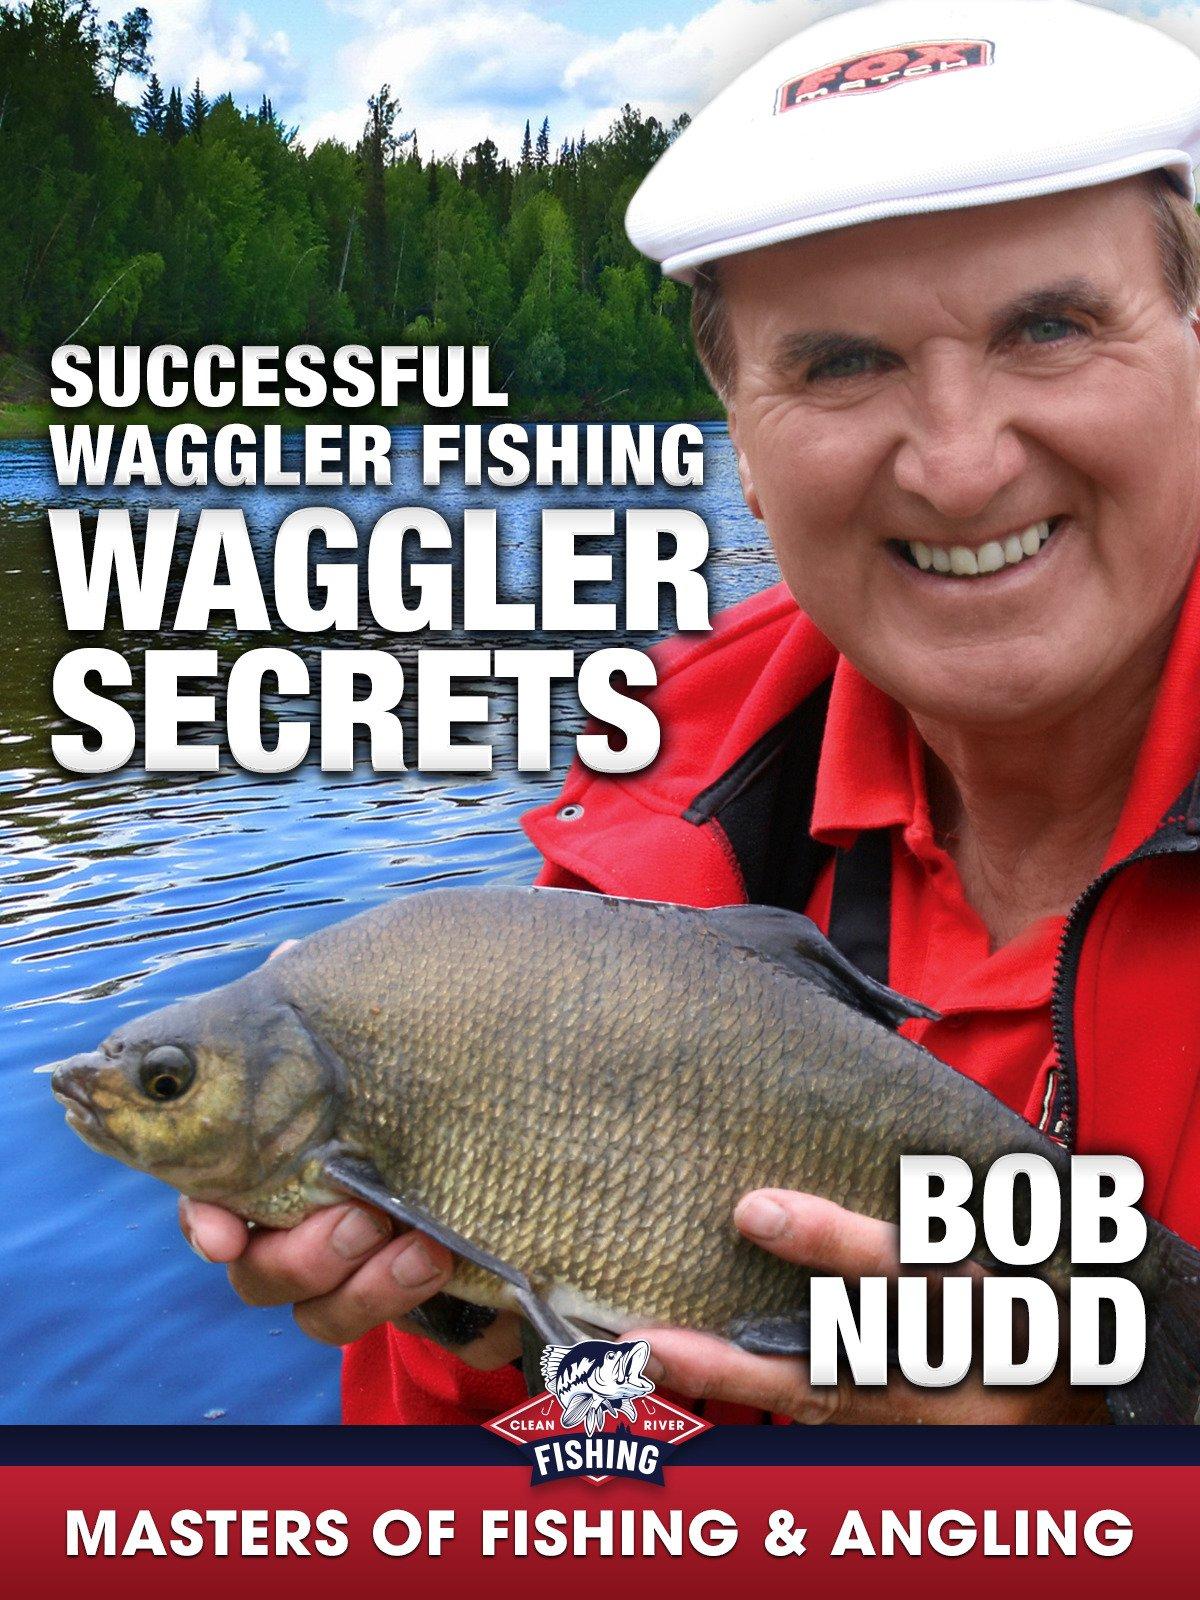 Waggler Secrets: Successful Waggler Fishing - Bob Nudd (Masters of Fishing & Angling)